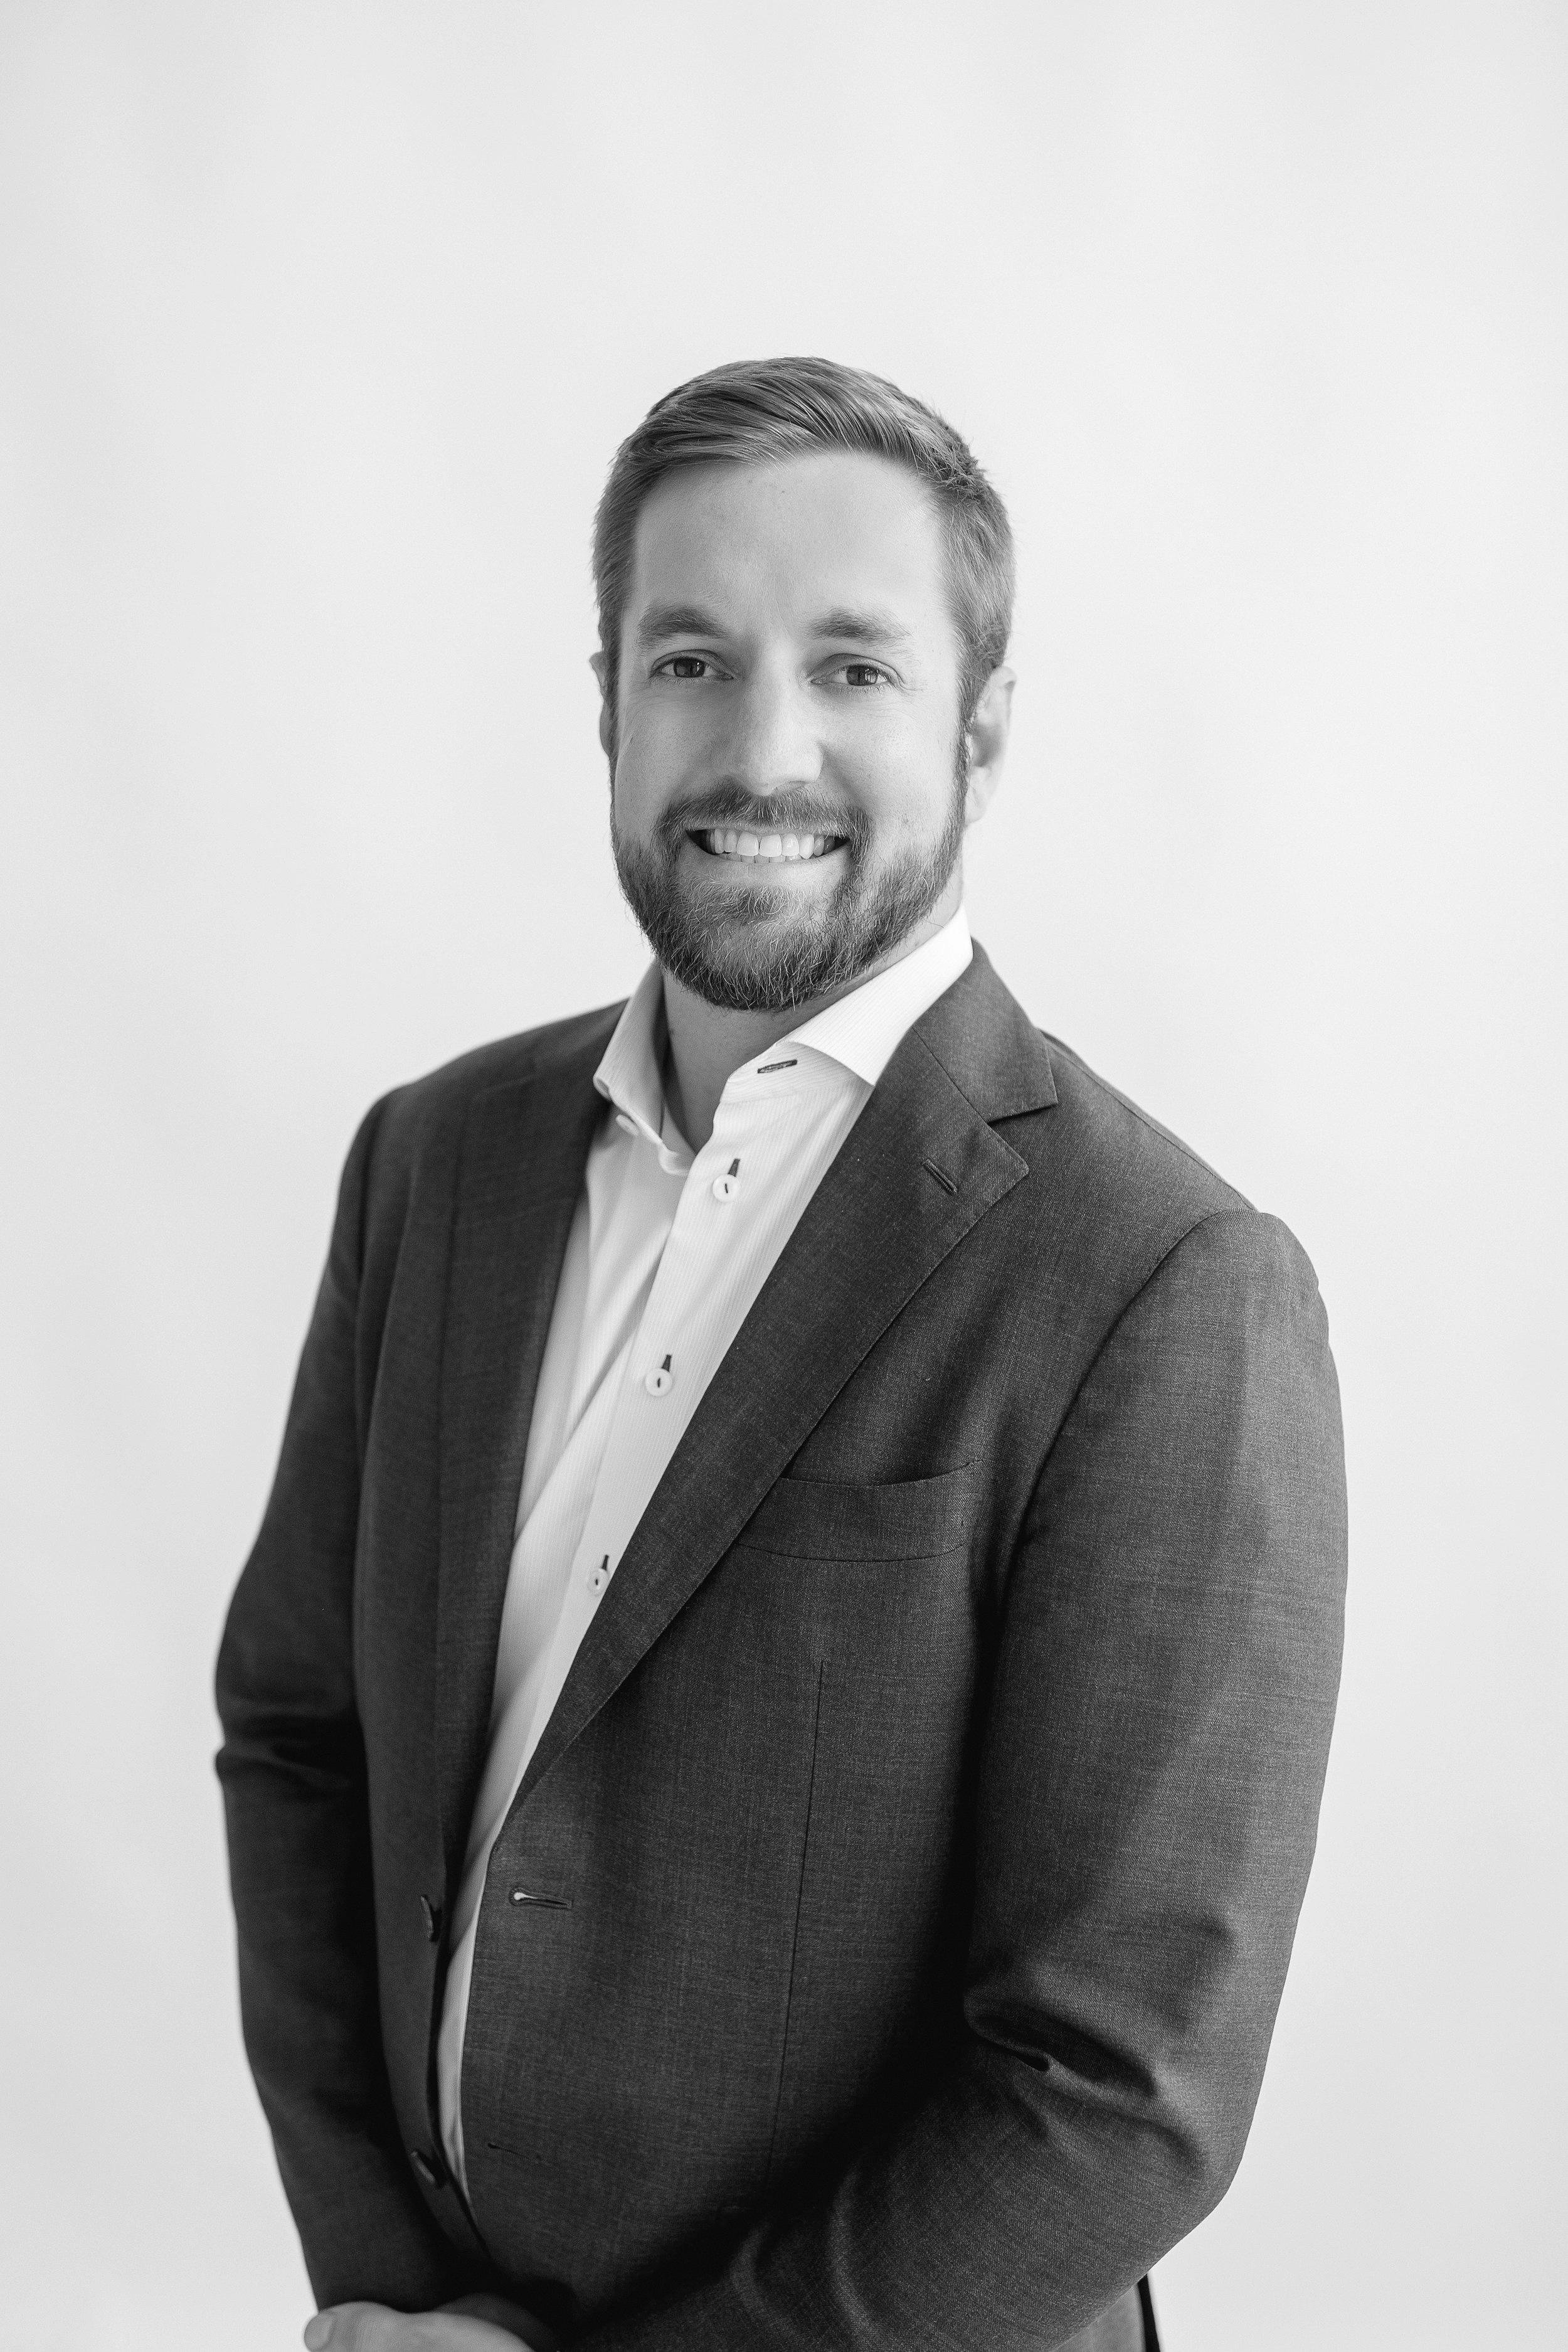 BRAD WOLFE | Managing Director - Development